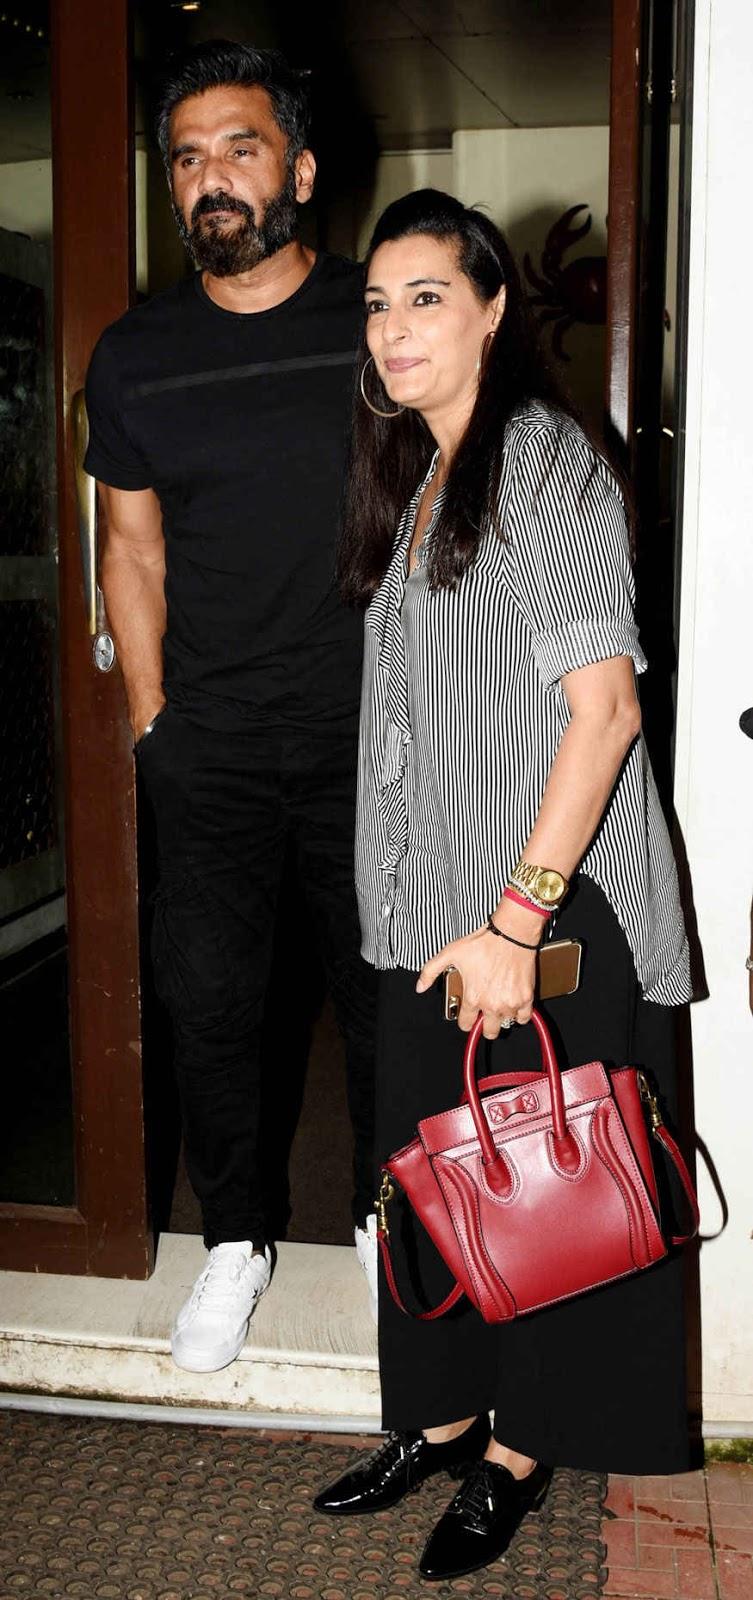 Suniel Shetty with Mana Shetty During her Birthday Party at Bestin